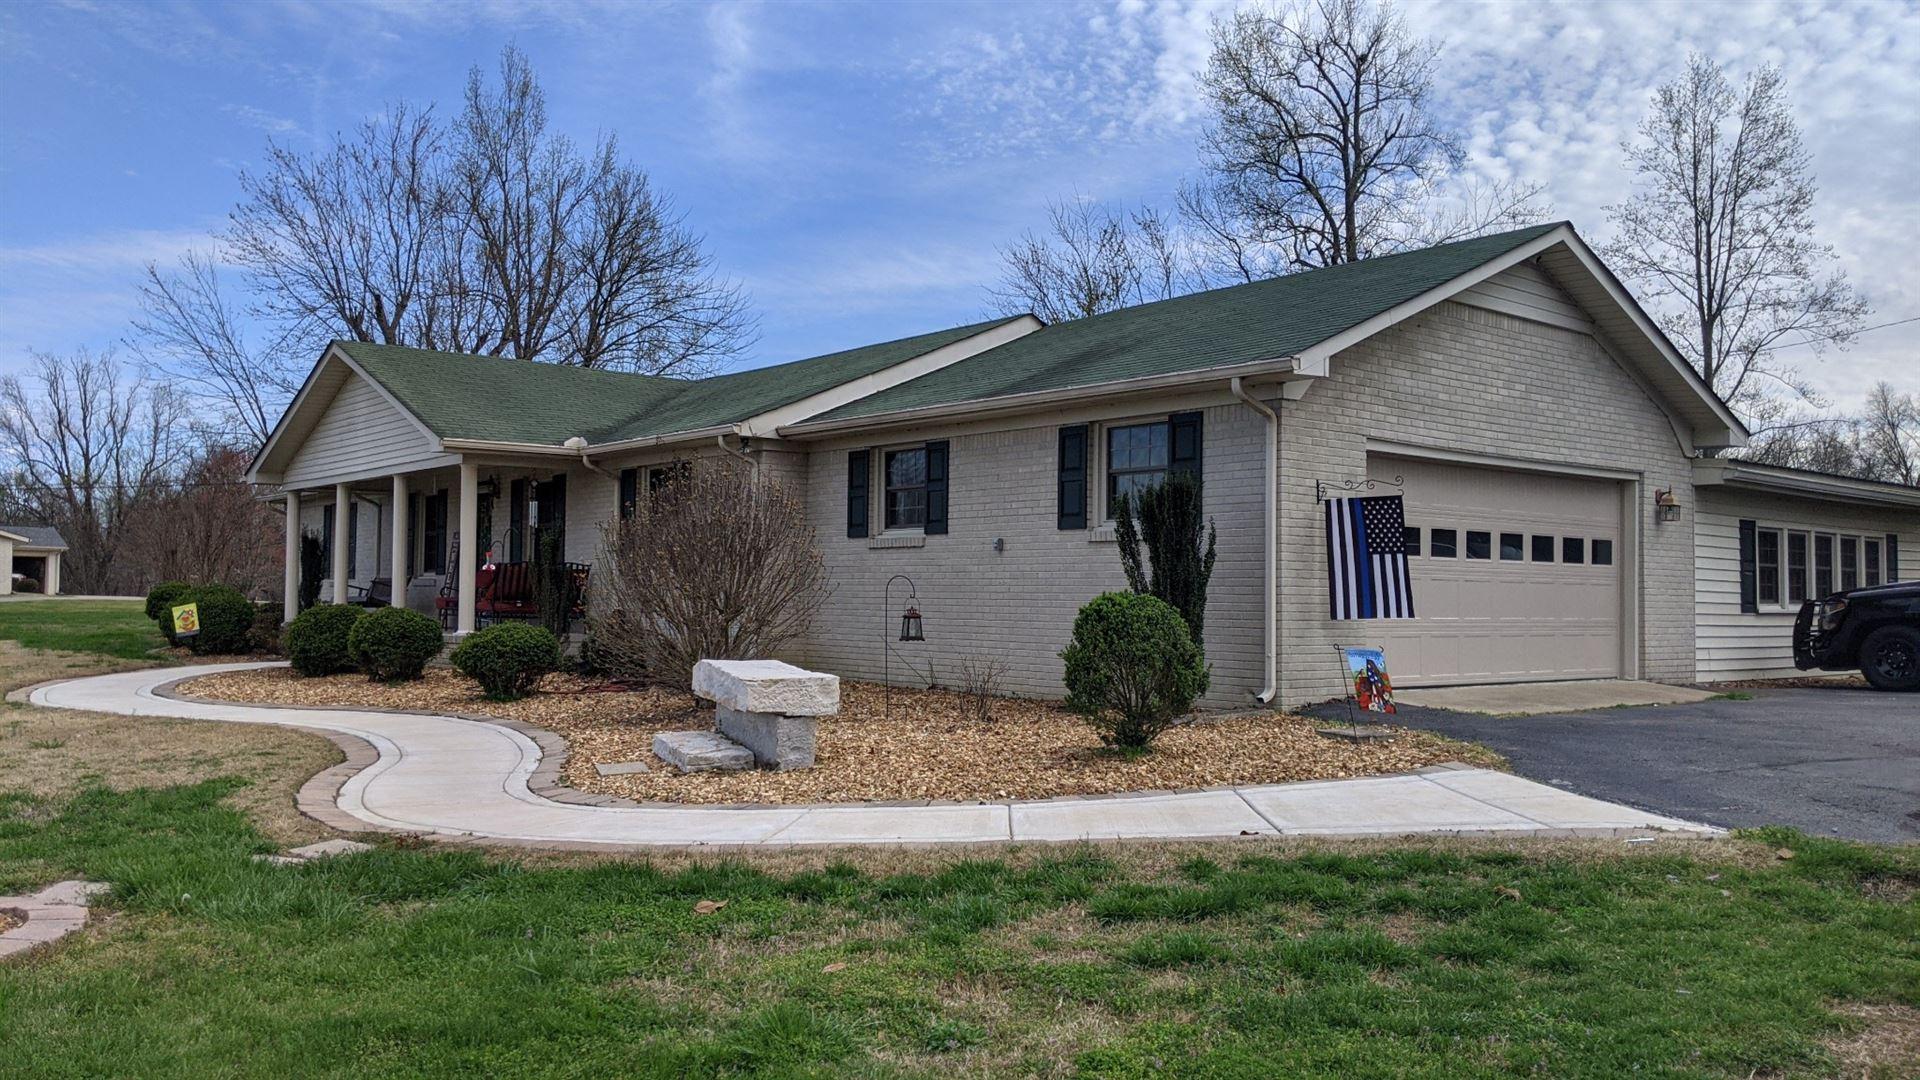 61 Orchard Hill Rd, Fayetteville, TN 37334 - MLS#: 2239921